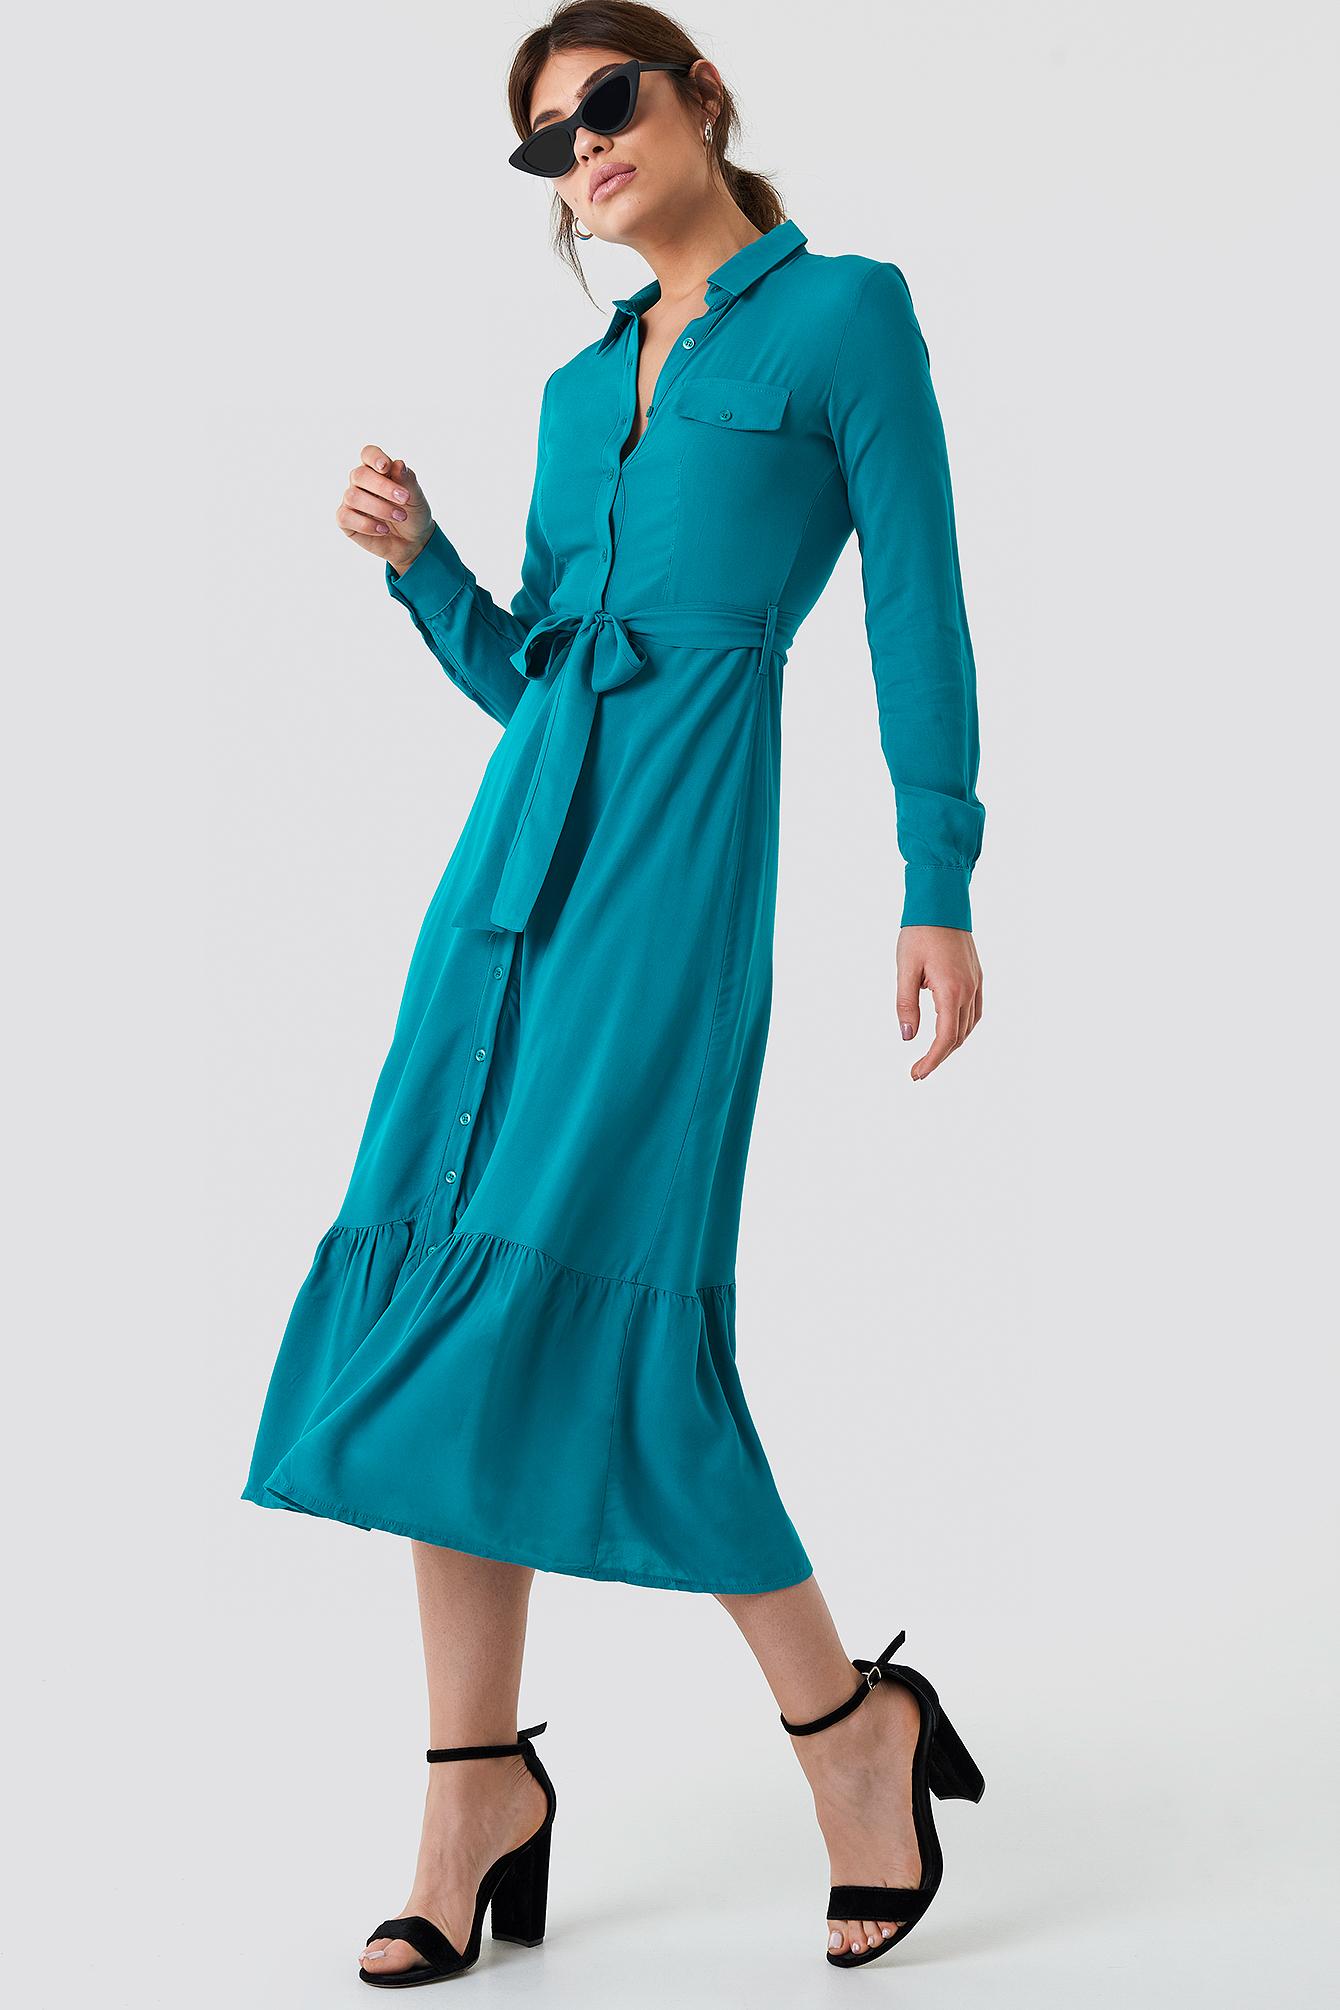 Ruffle Bottom Shirt Dress - Turquoise